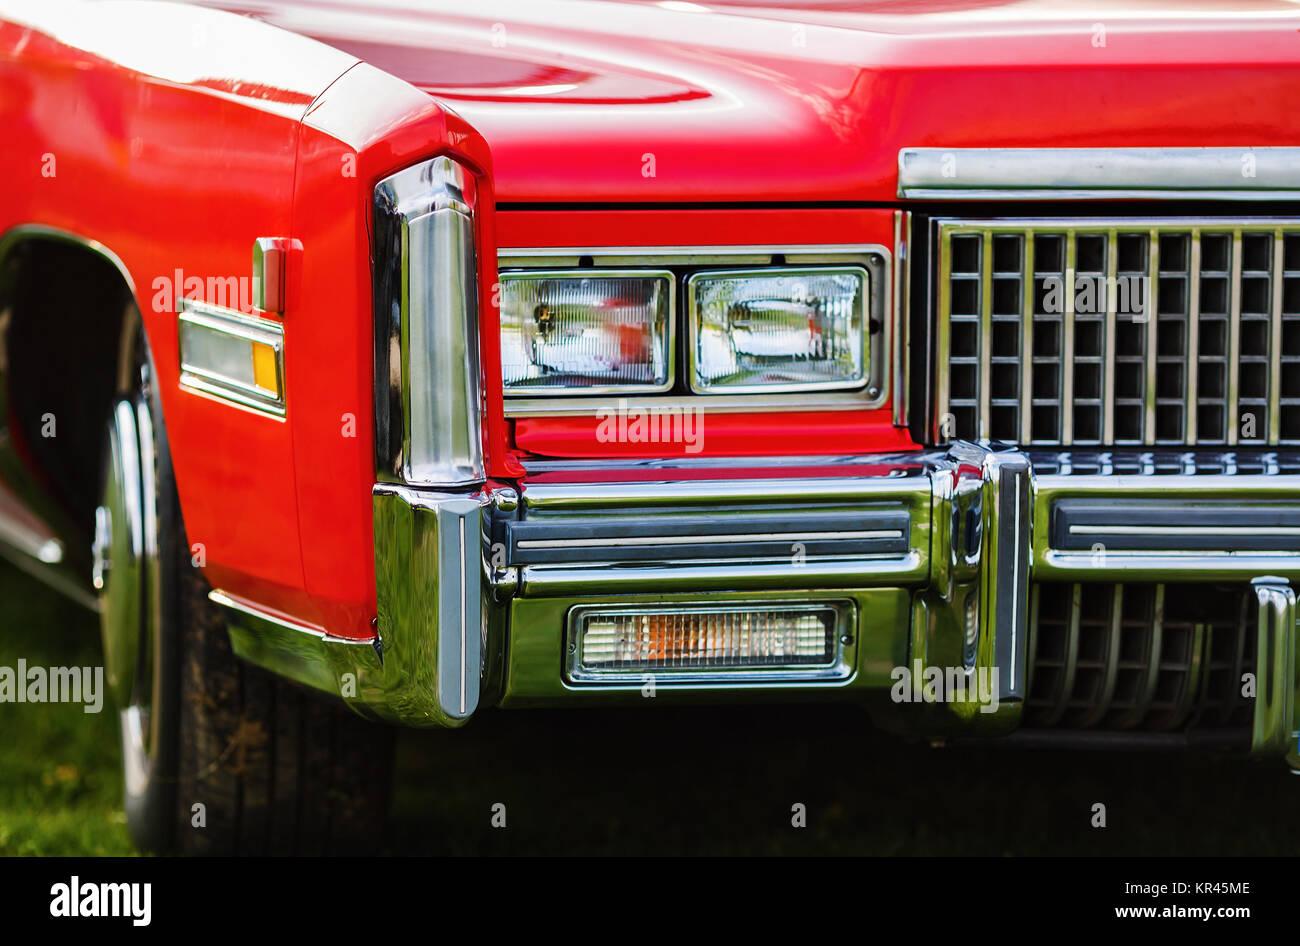 Red retro car - Stock Image